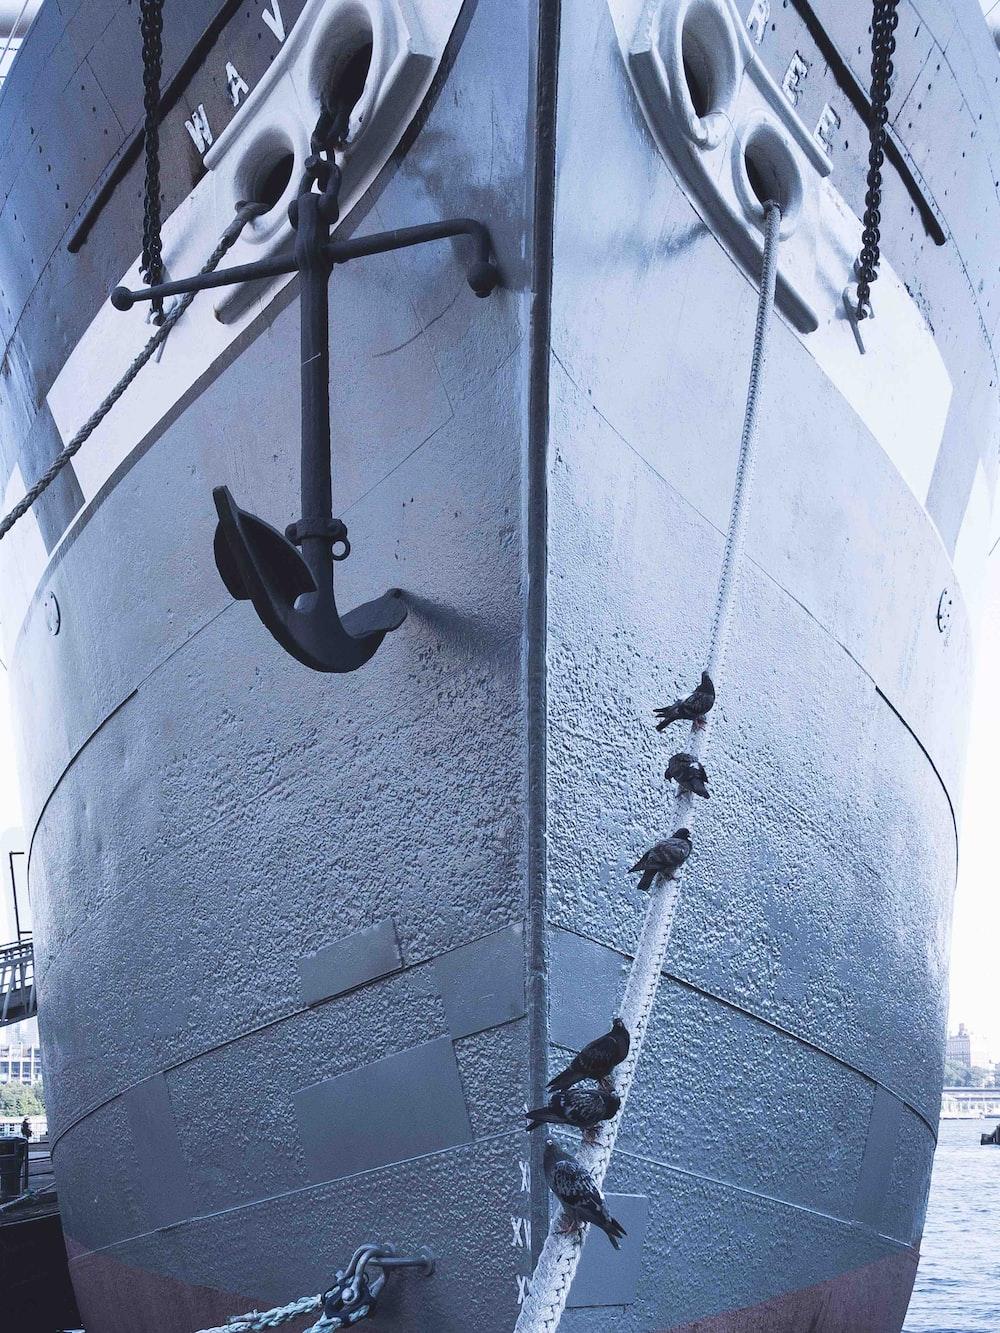 low angle photo of ship